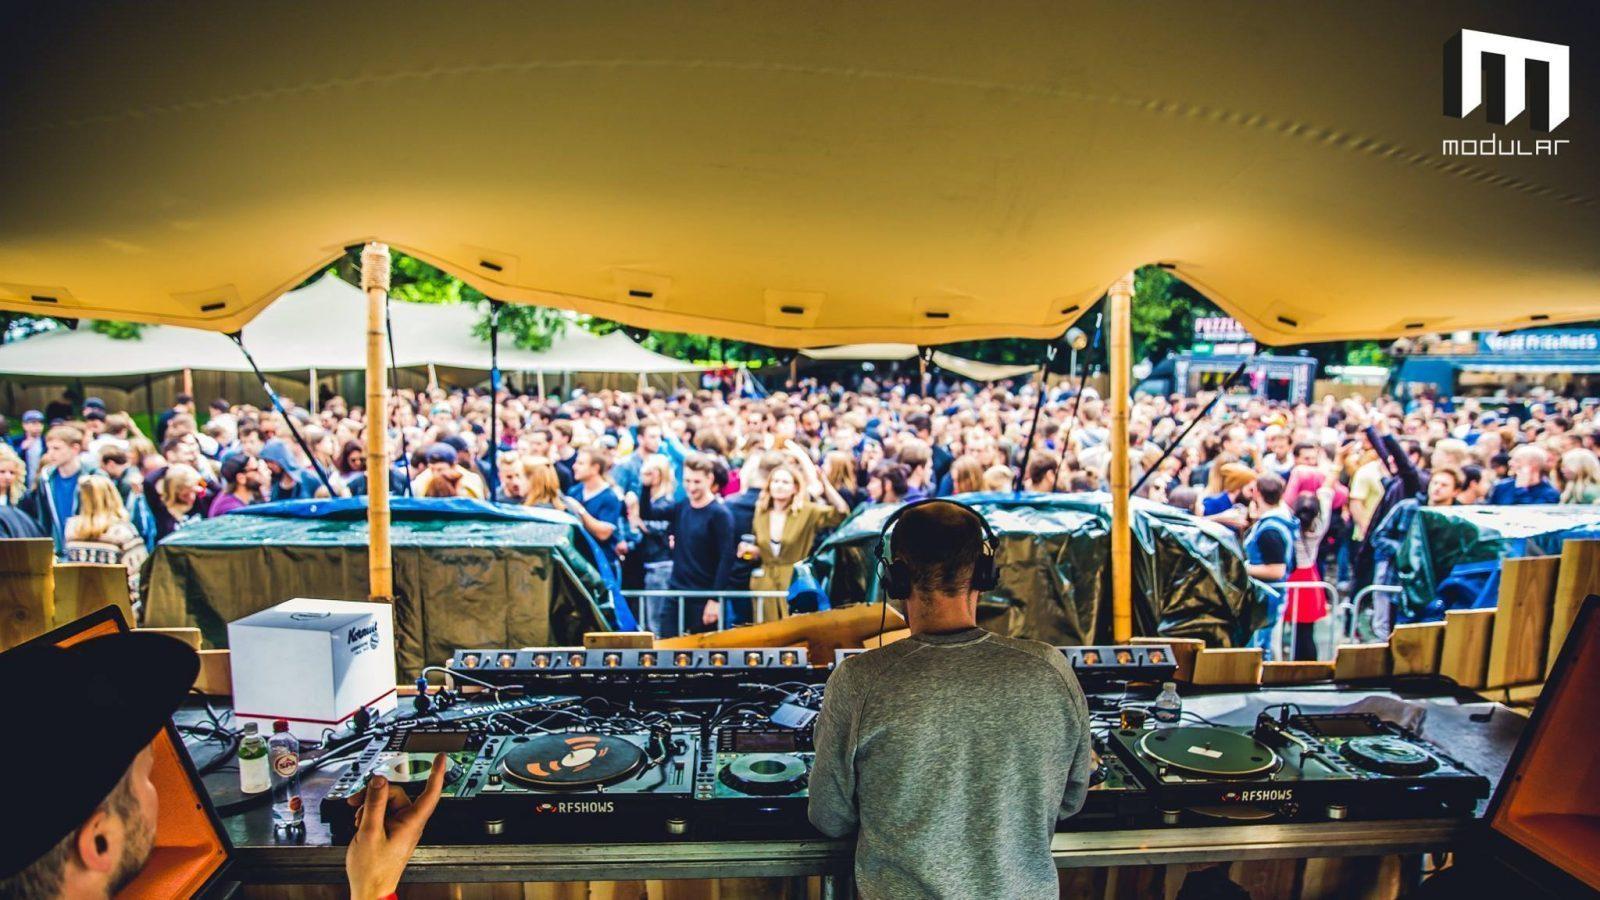 modular festival rotterdam